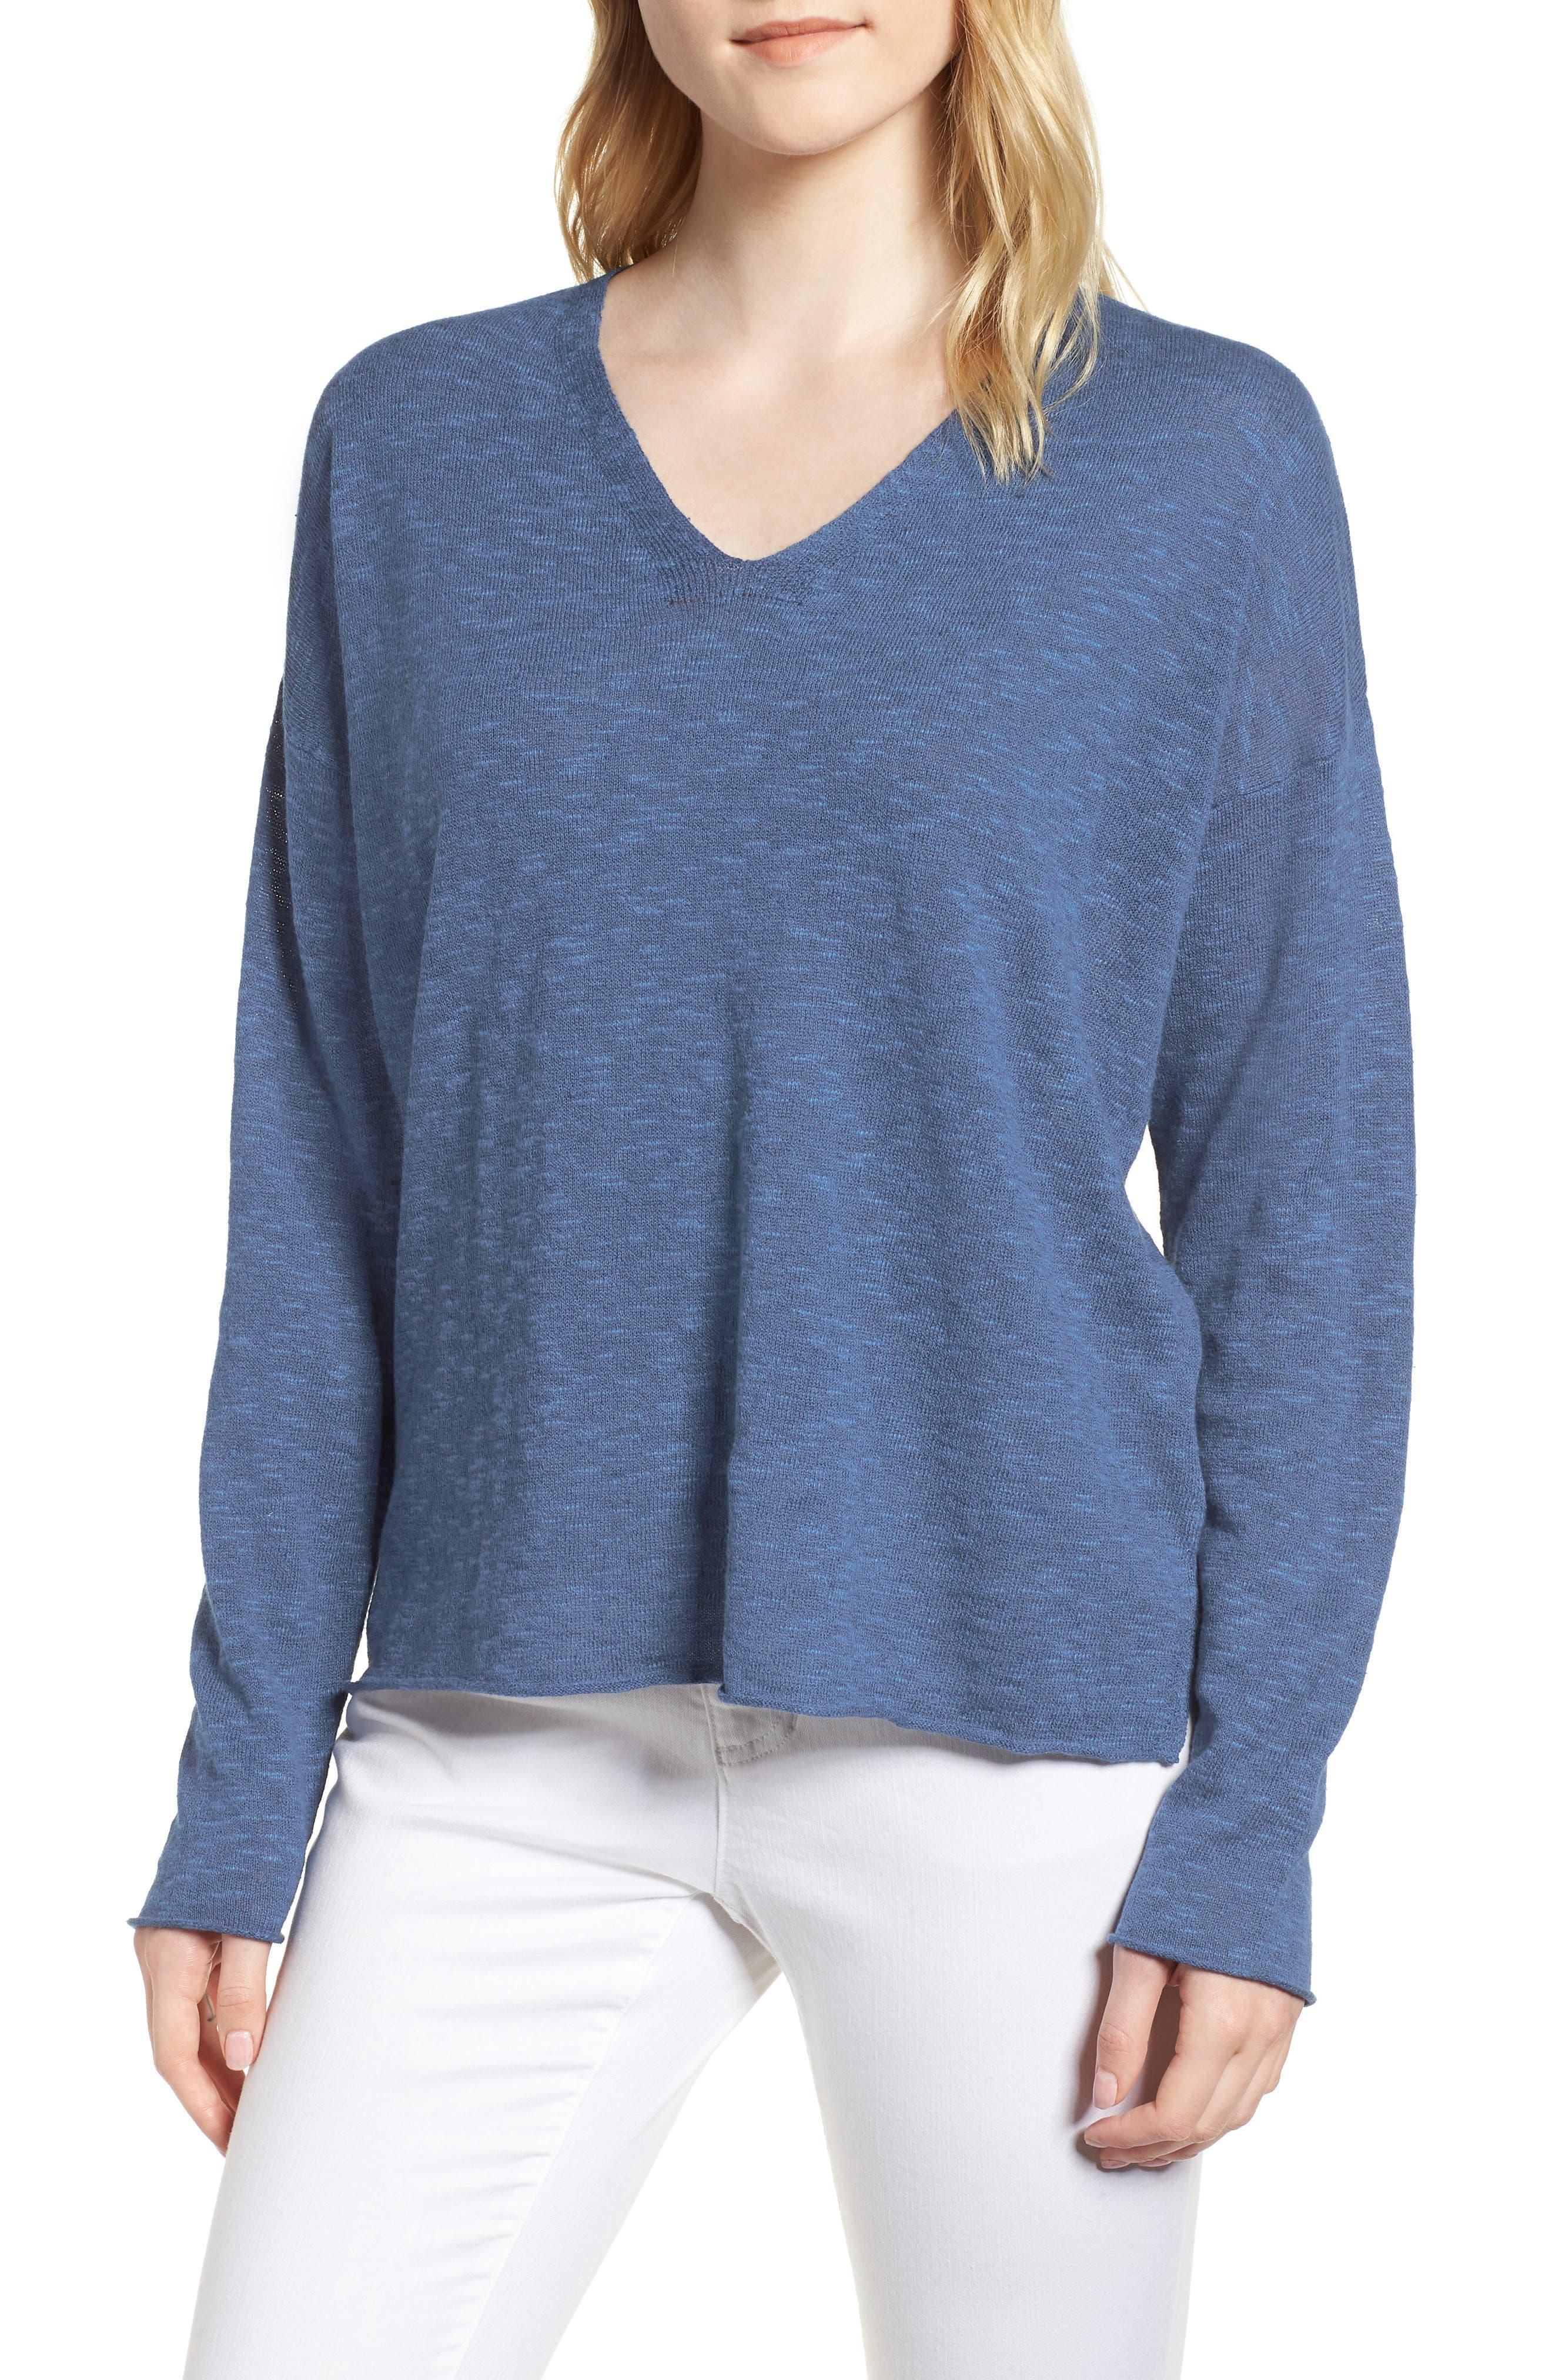 Eileen Fisher Boxy Organic Linen & Cotton Sweater